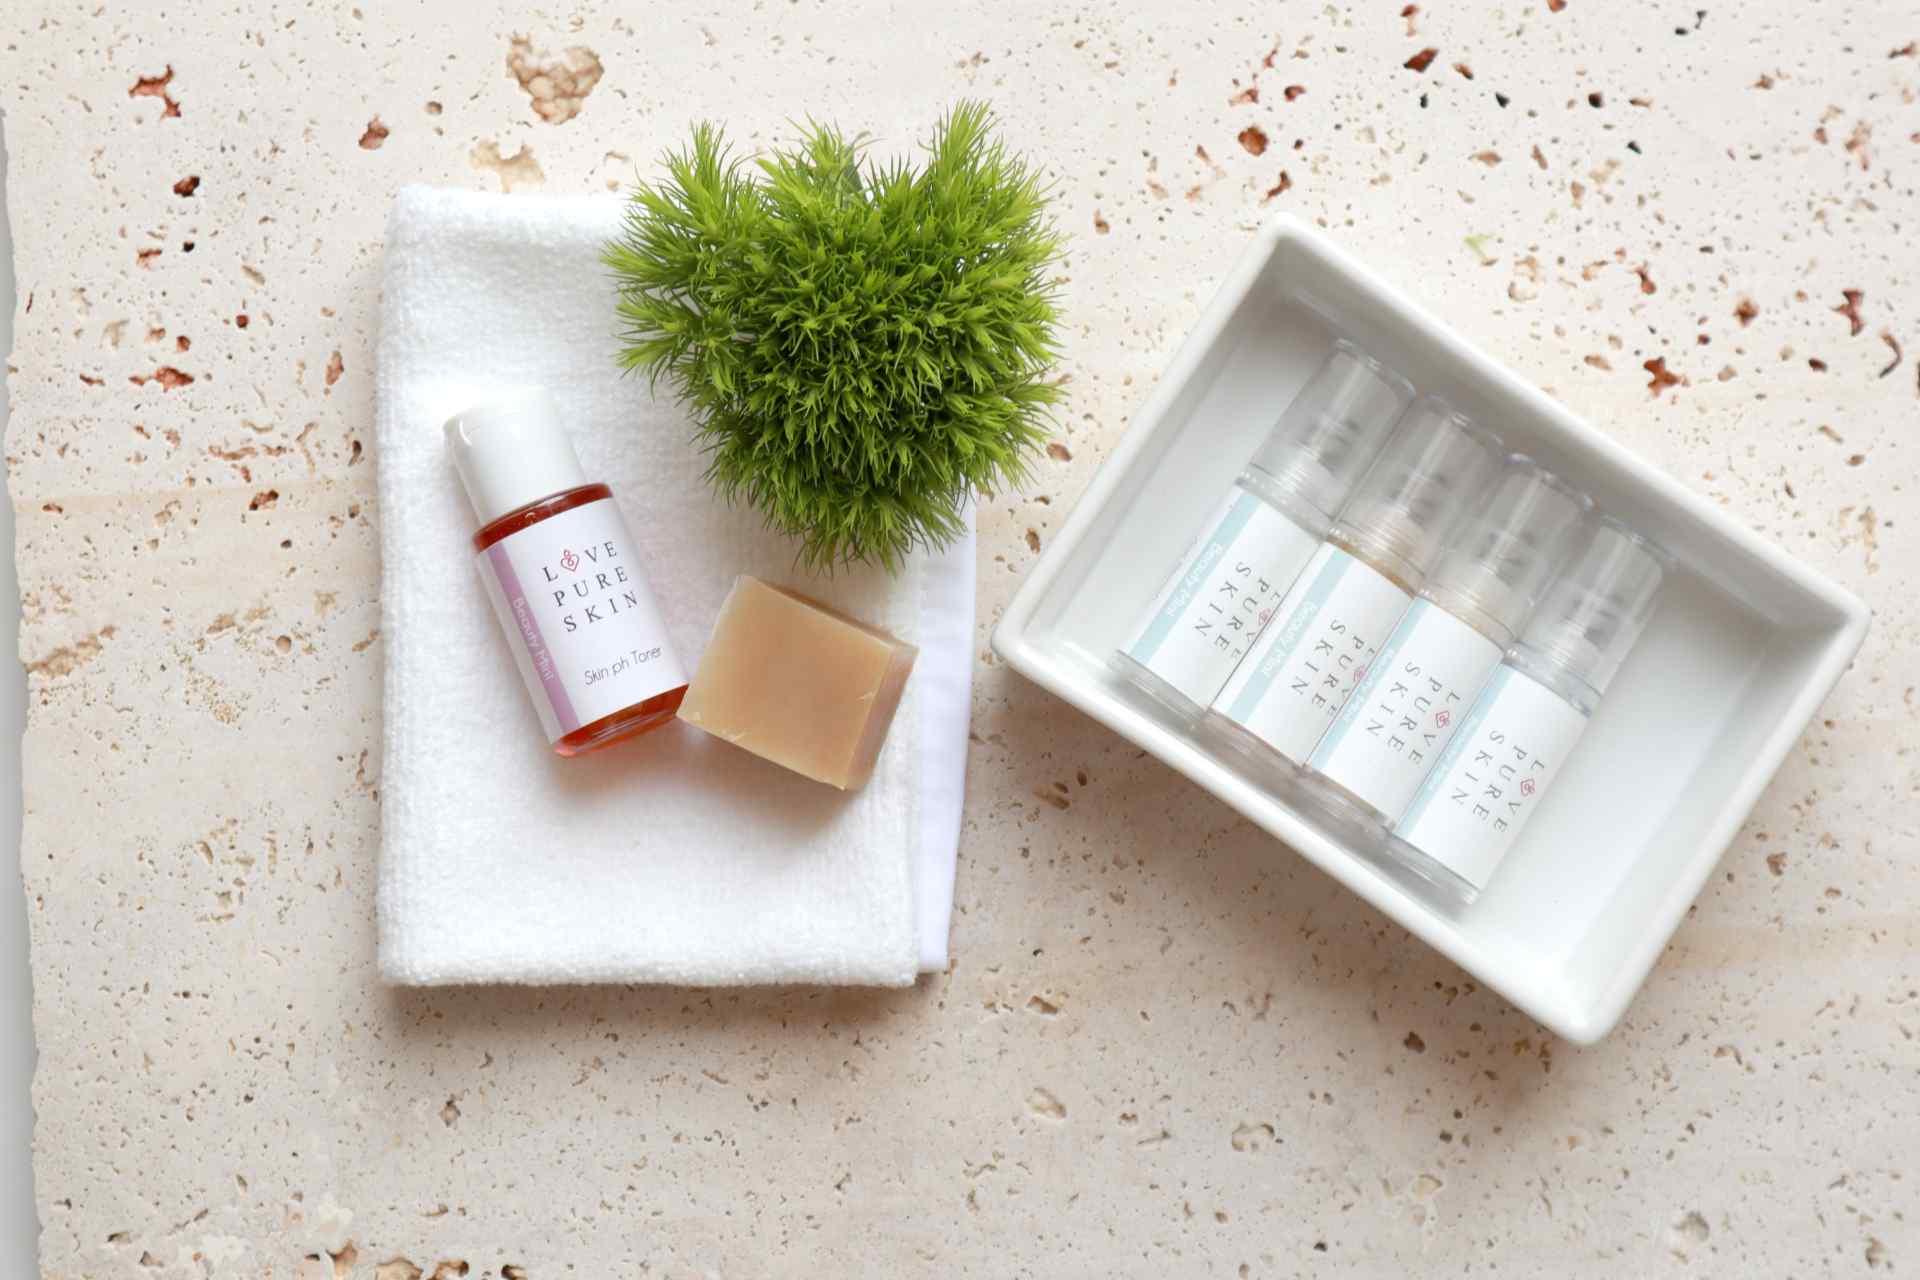 LOVE PURE SKIN Beauty Mini-Set 1 für fettige unreine Haut